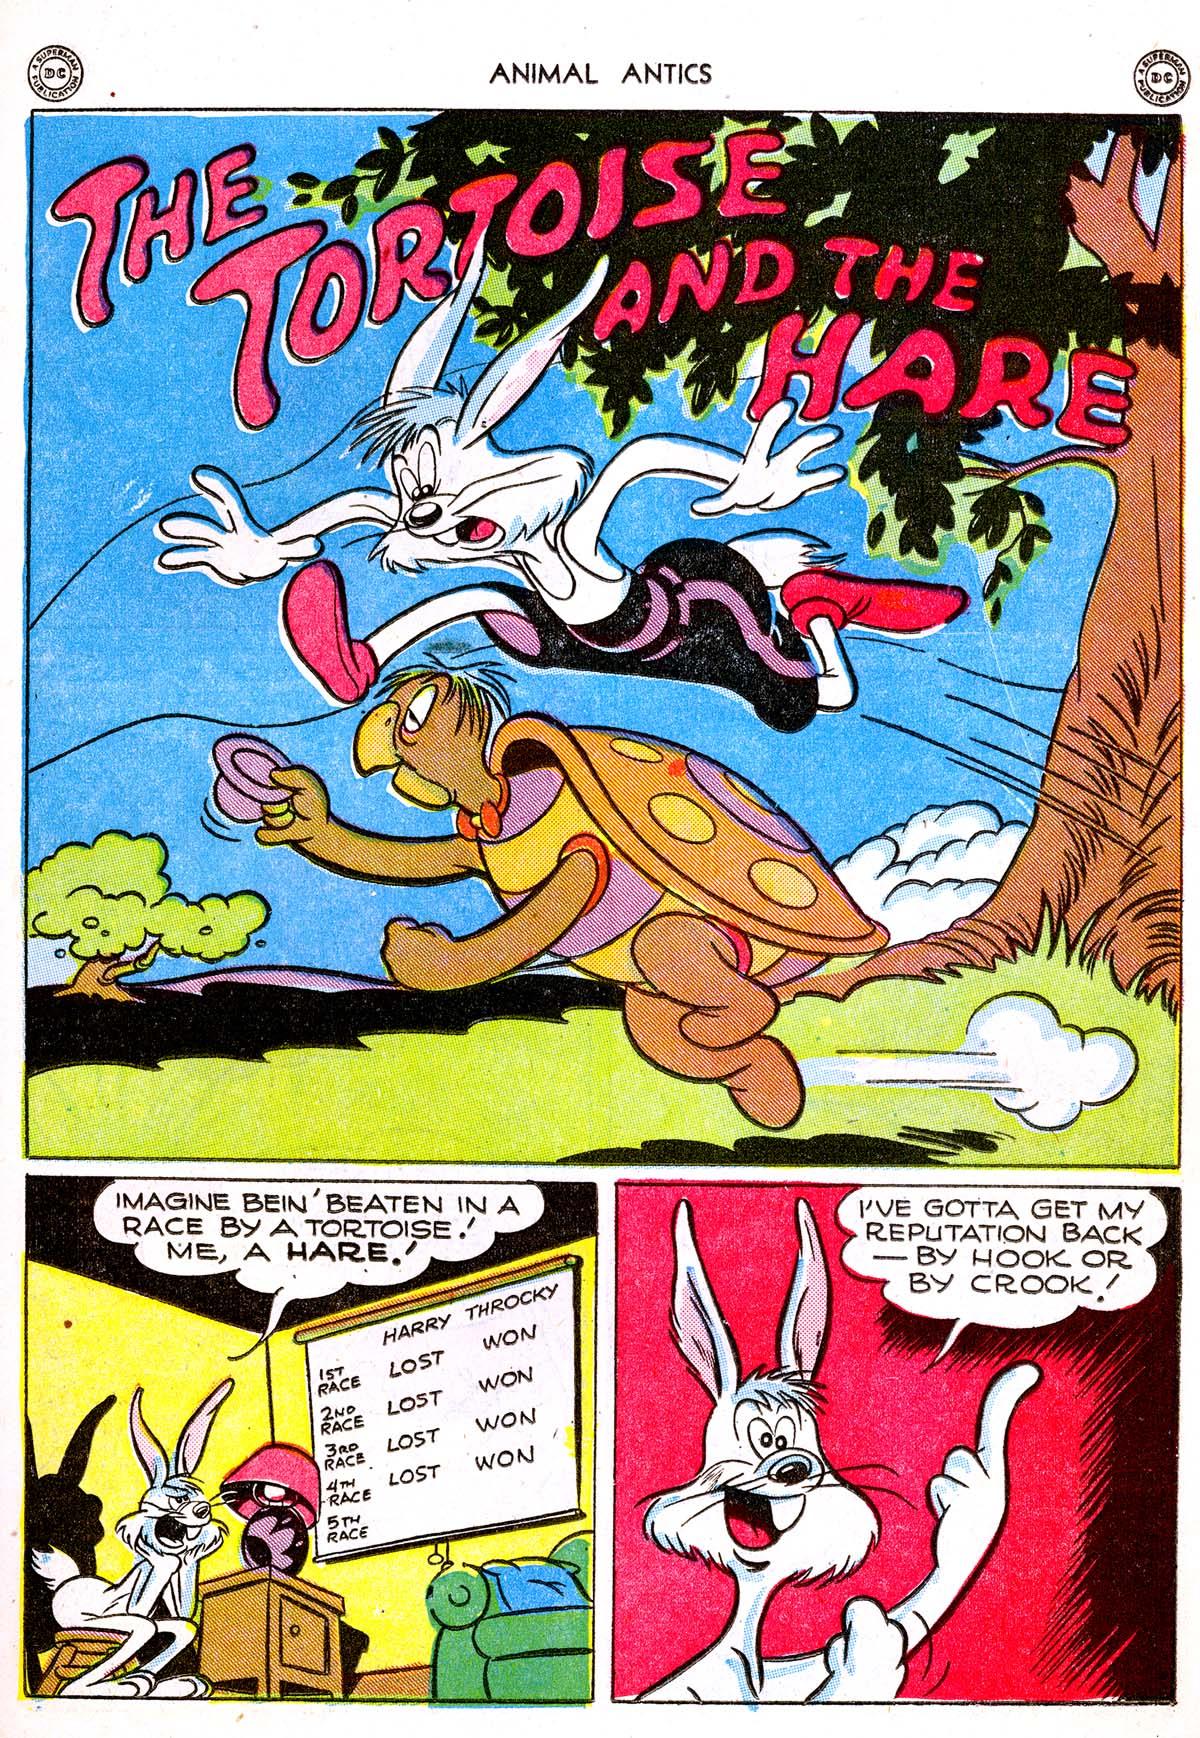 Read online Animal Antics comic -  Issue #1 - 21